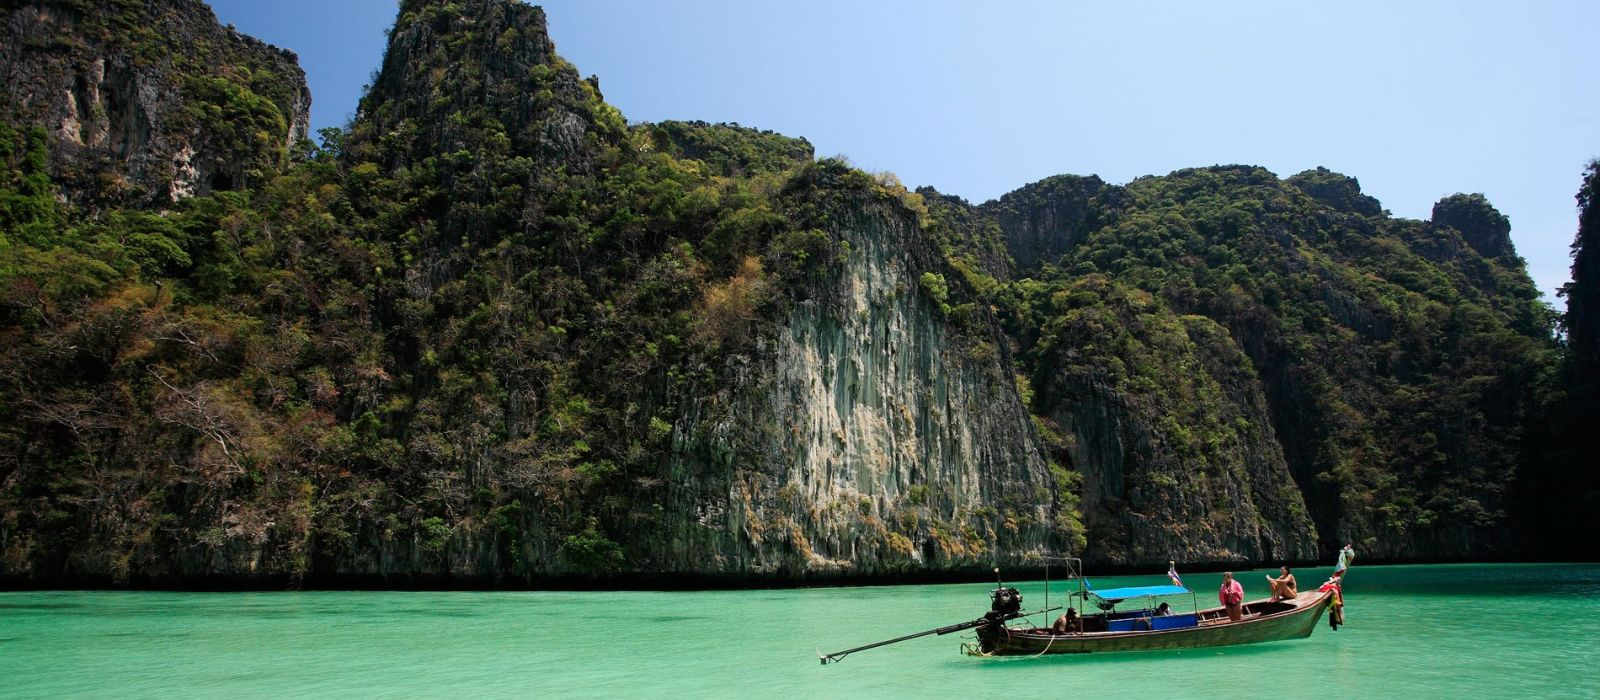 Destination Koh Phi Phi Thailand